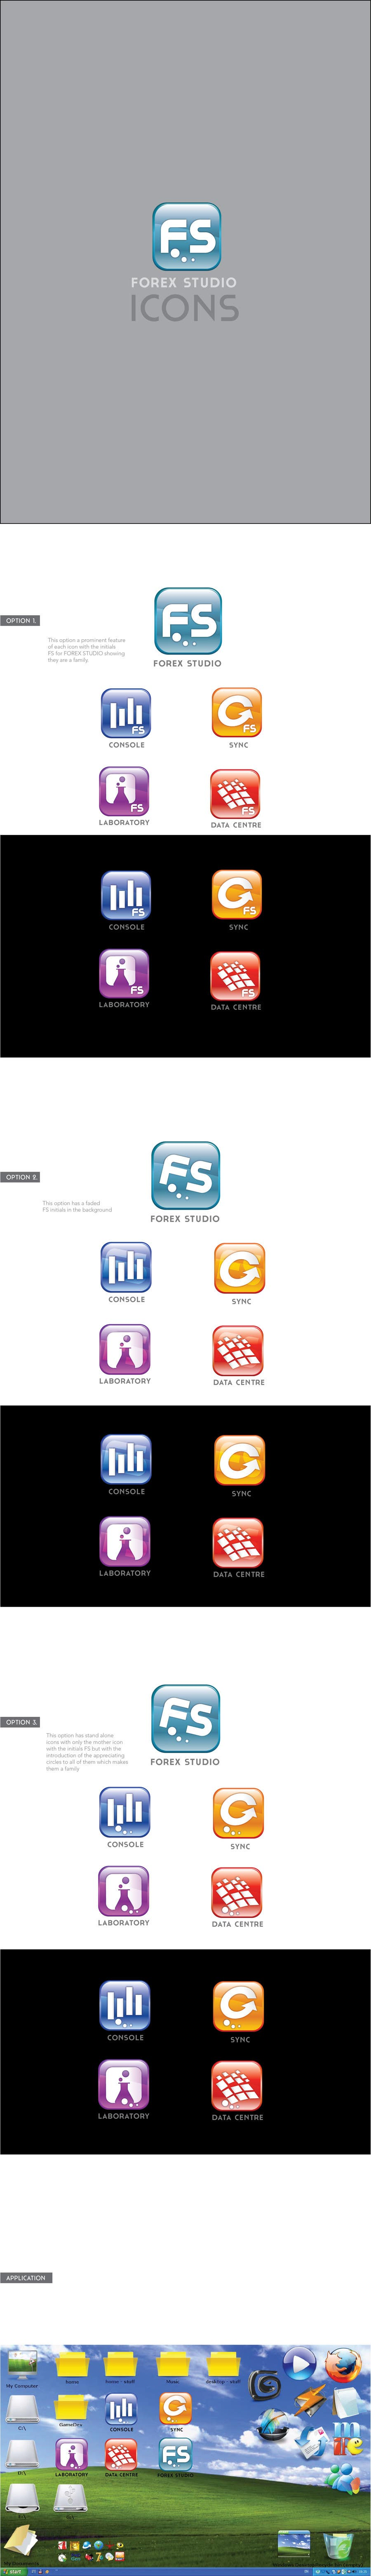 Konkurrenceindlæg #                                        32                                      for                                         Application Icons for Forex Studio (Windows software)